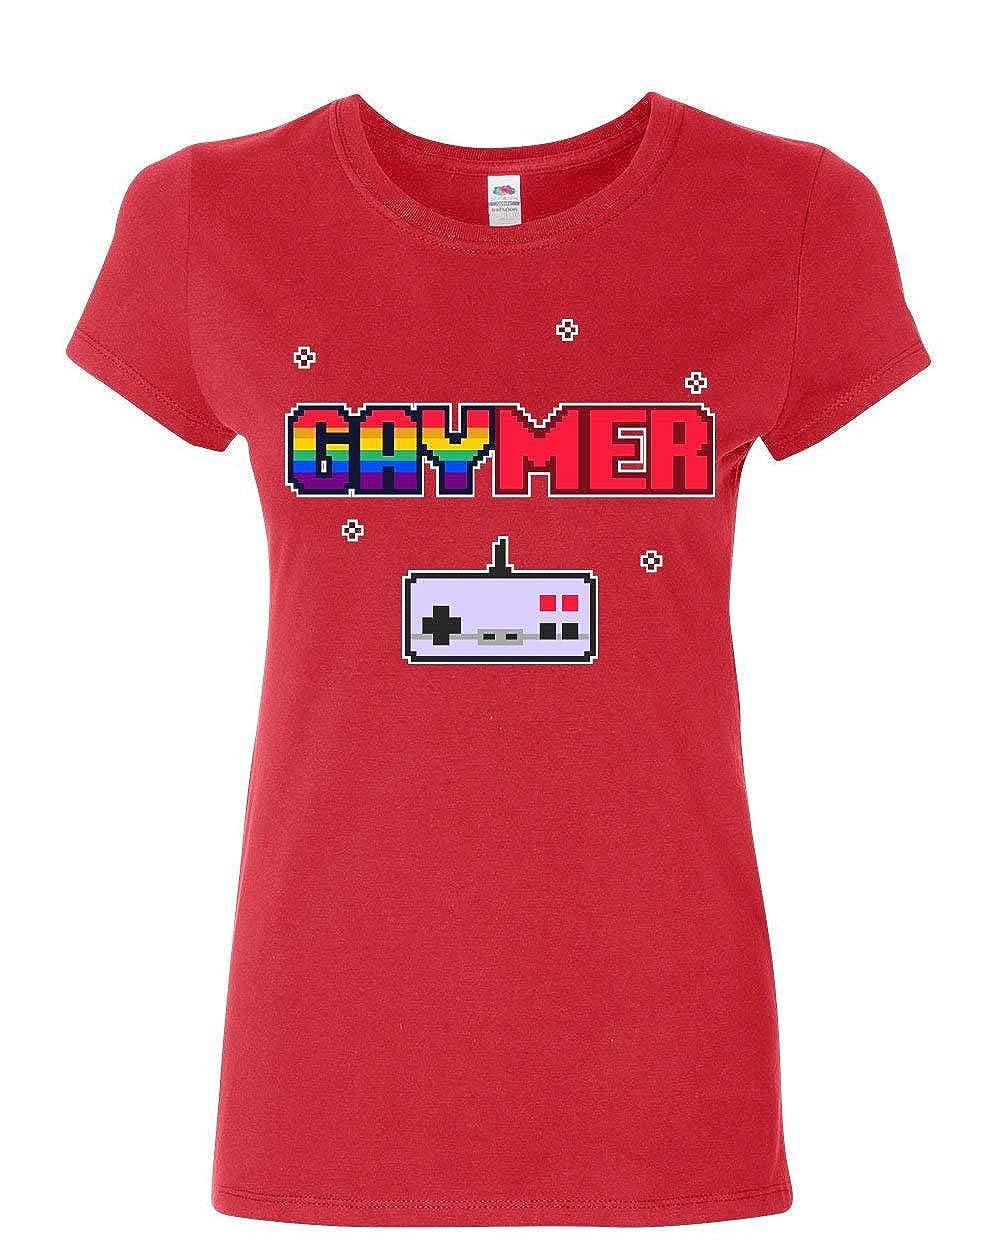 Gaymer Womens T-Shirt LGBT Queer Rainbow Gay Gaming Console Controller Shirt